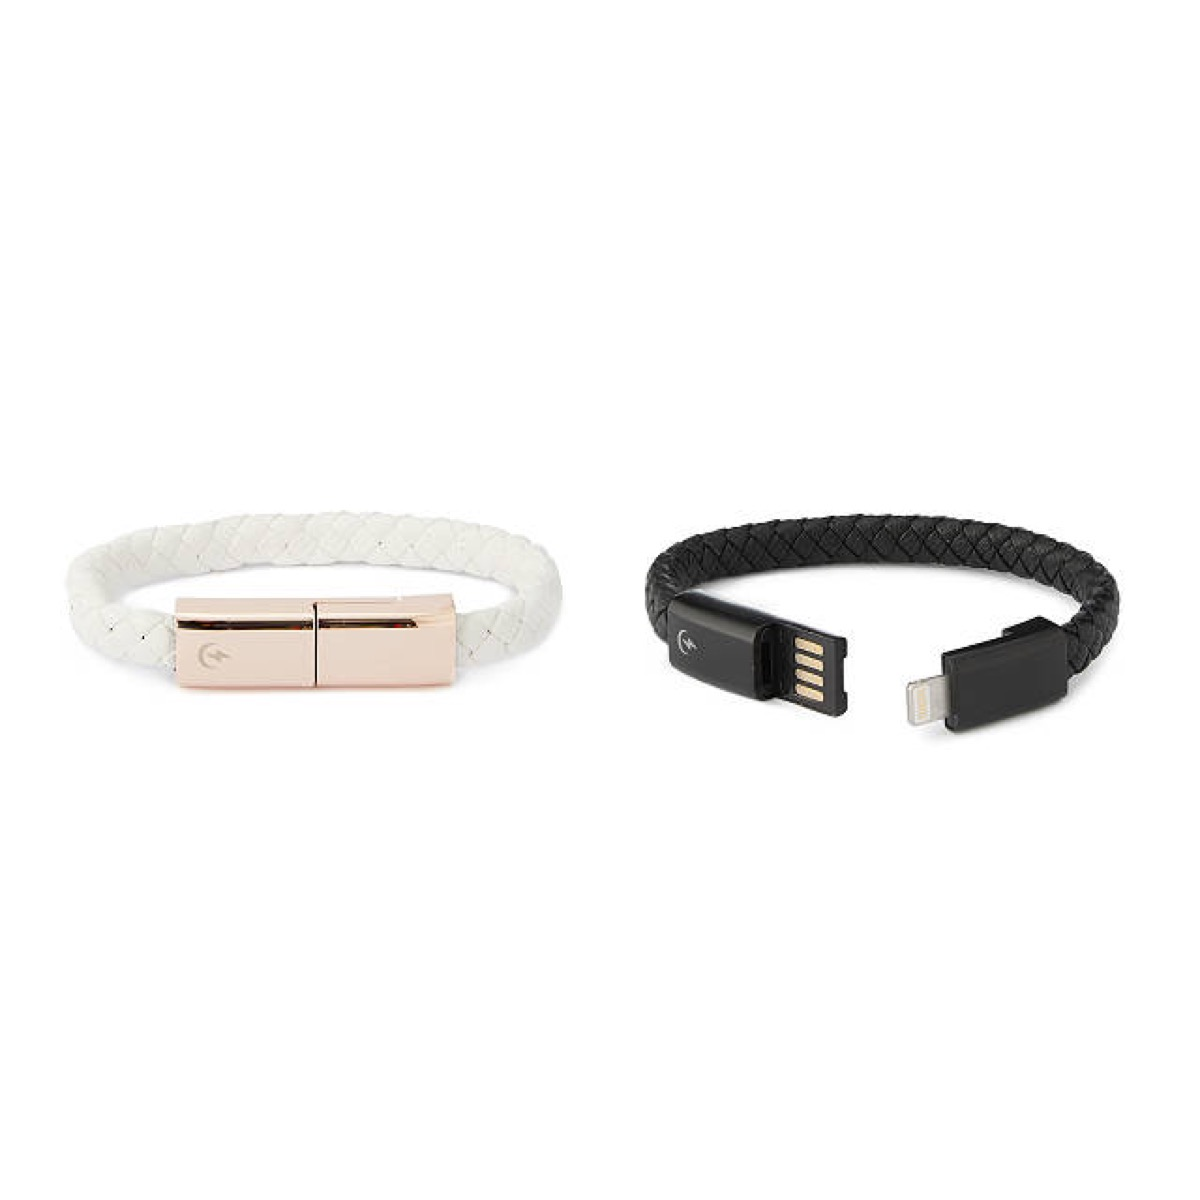 white and black charging bracelets